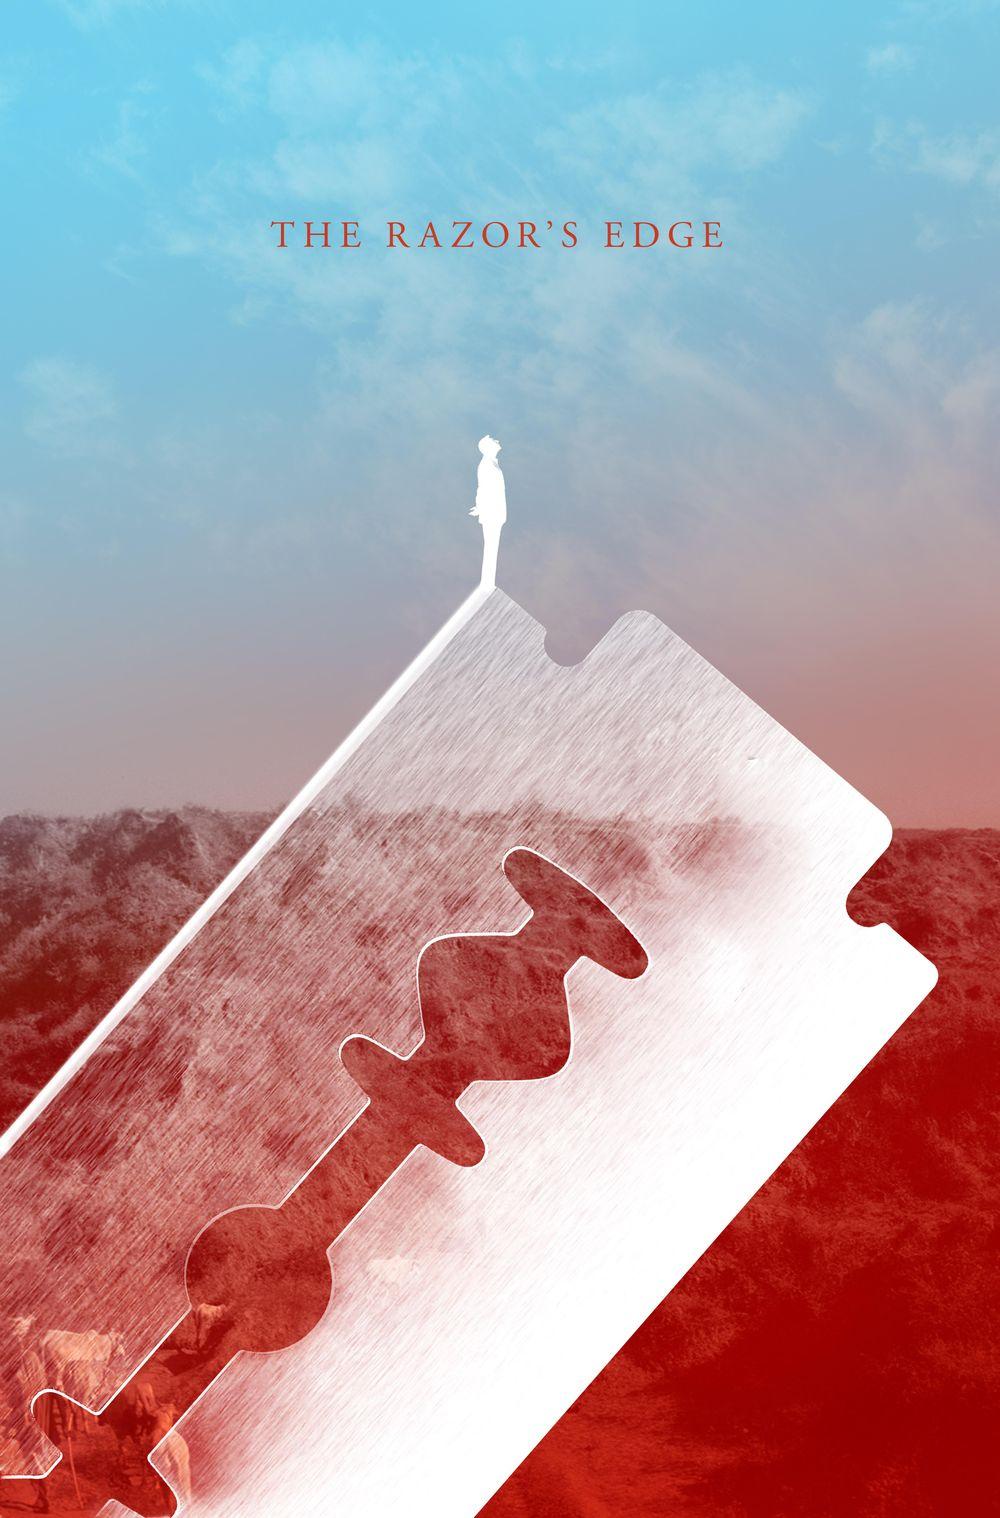 The Razor's Edge - image 2 - student project